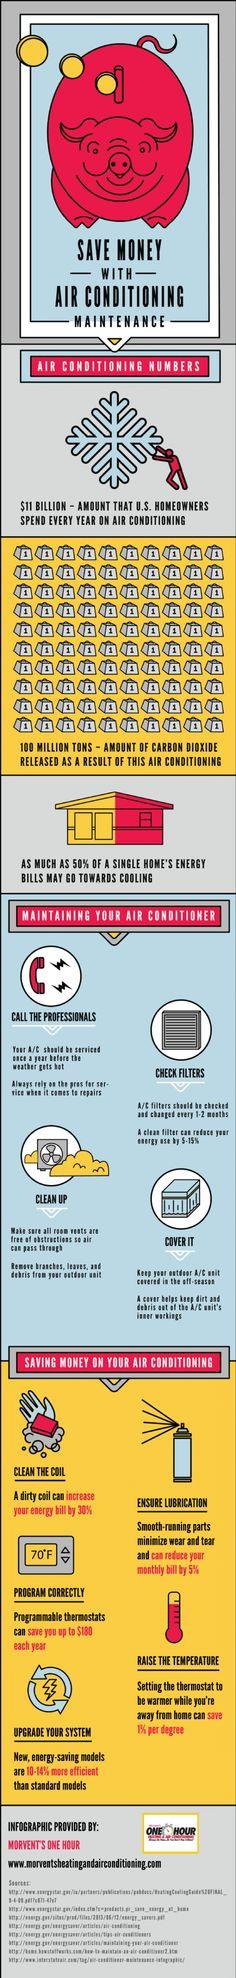 HV1035 HVAC Maintenance Service Agreement with Backside